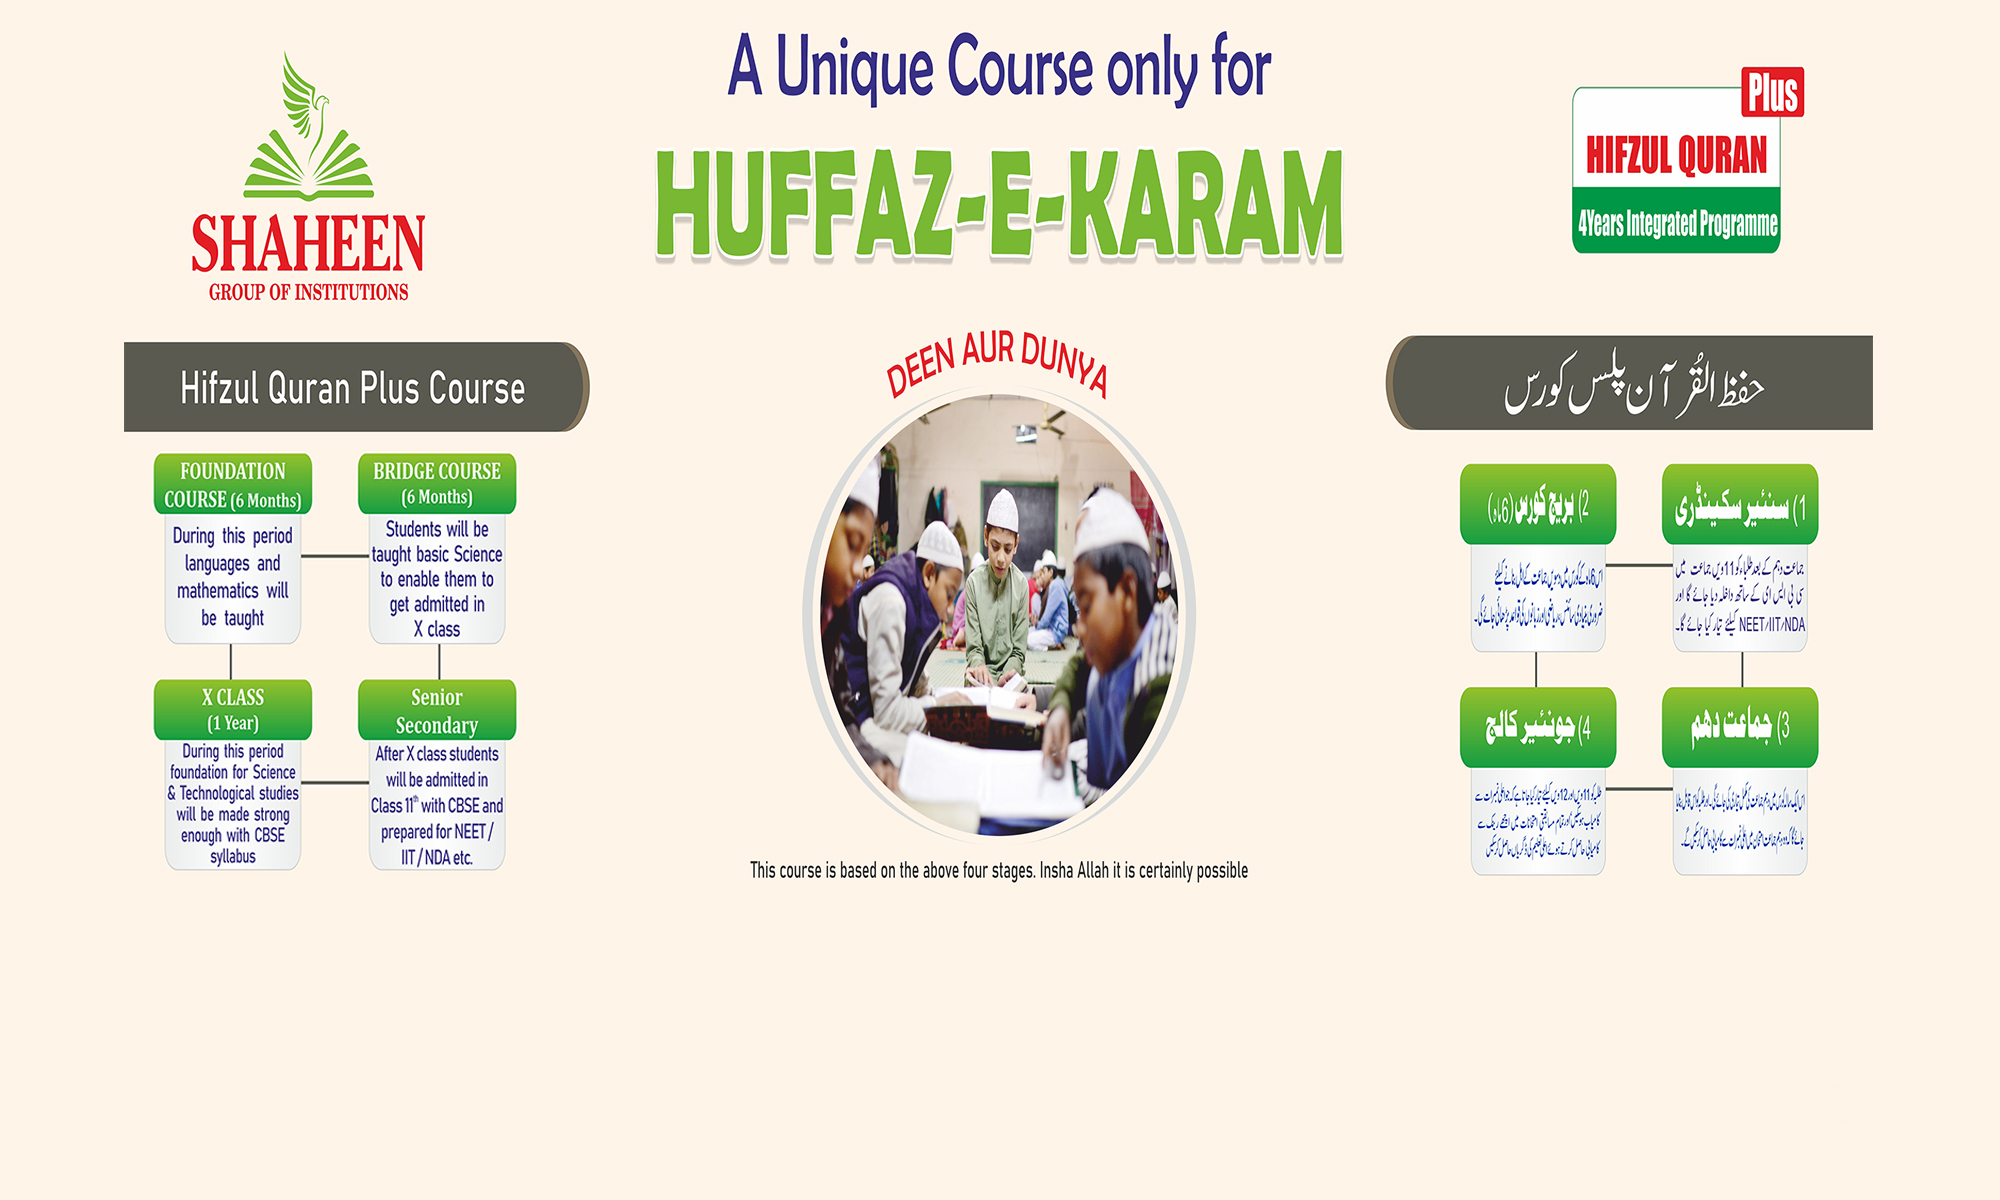 Hifzul Quran Plus